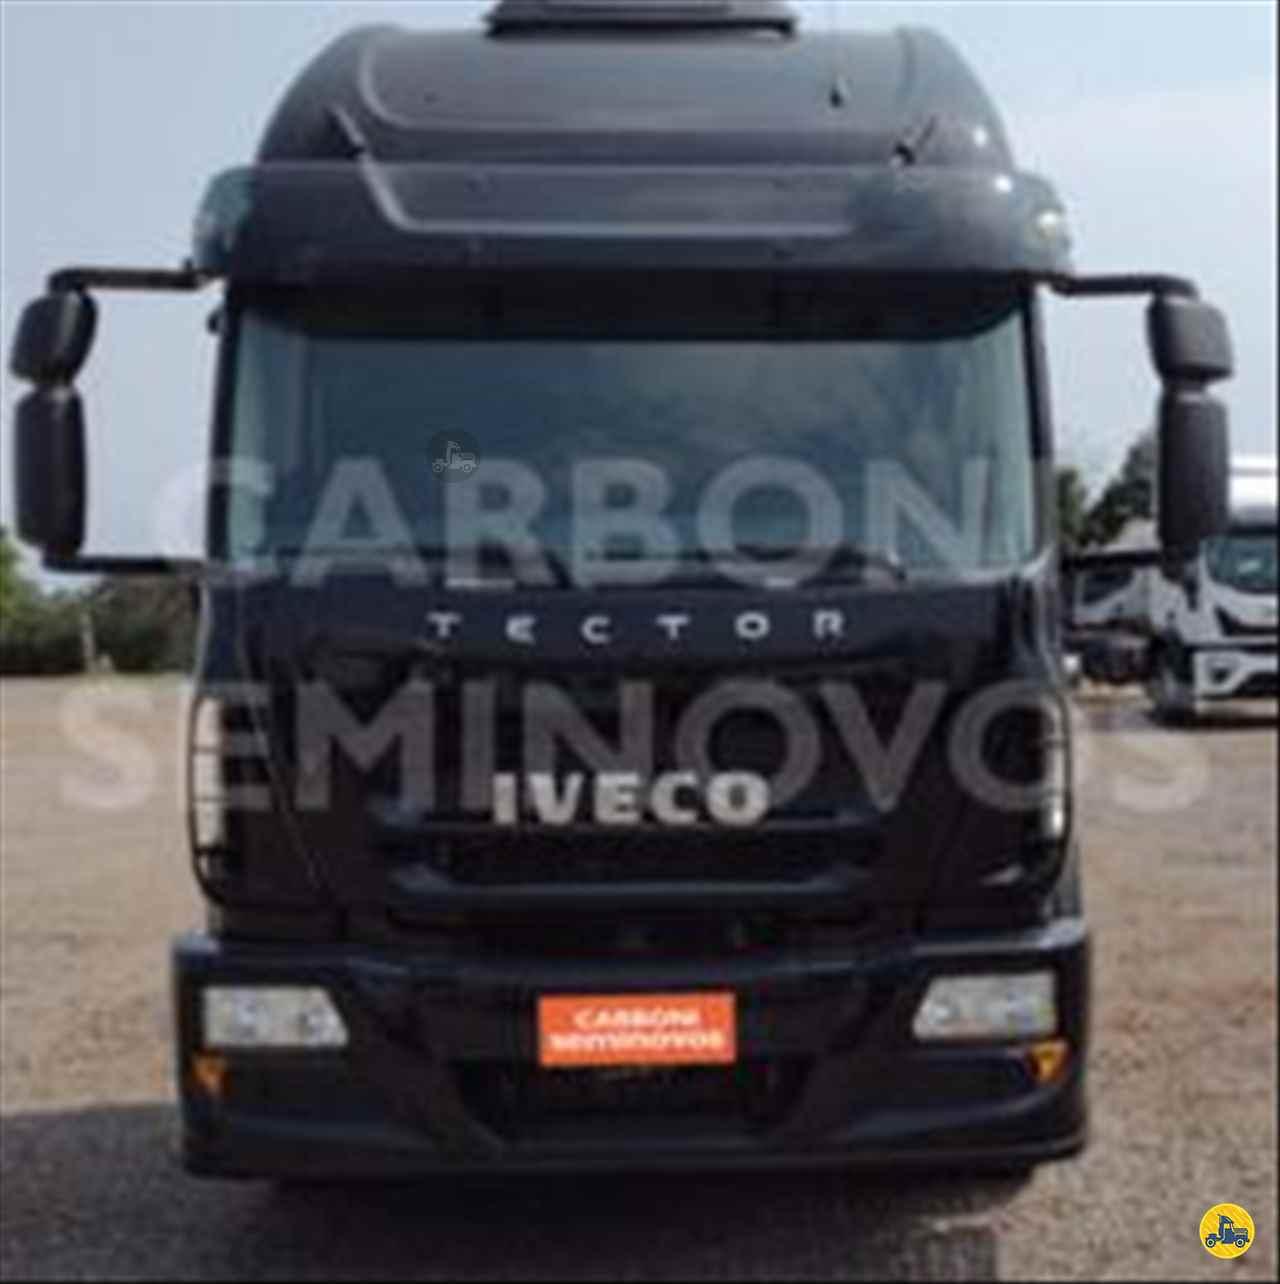 CAMINHAO IVECO TECTOR 240E30 Chassis BiTruck 8x2 Carboni Iveco VIDEIRA SANTA CATARINA SC